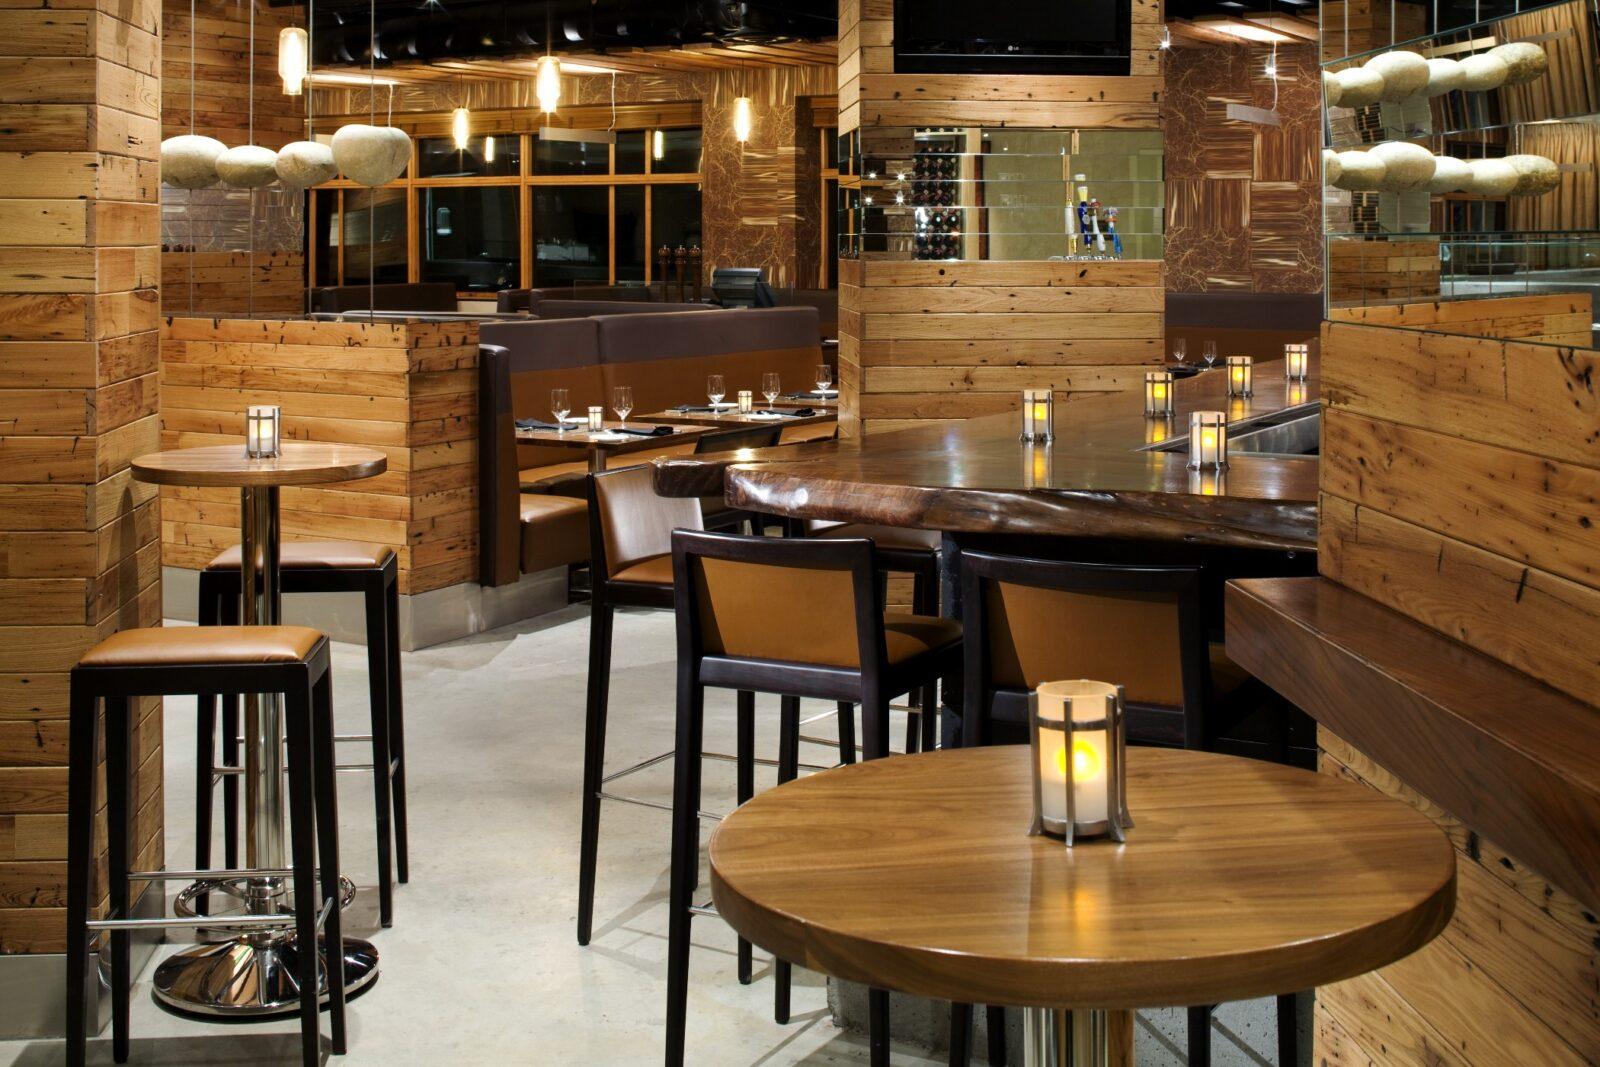 bars & restaurants - namco refurbs